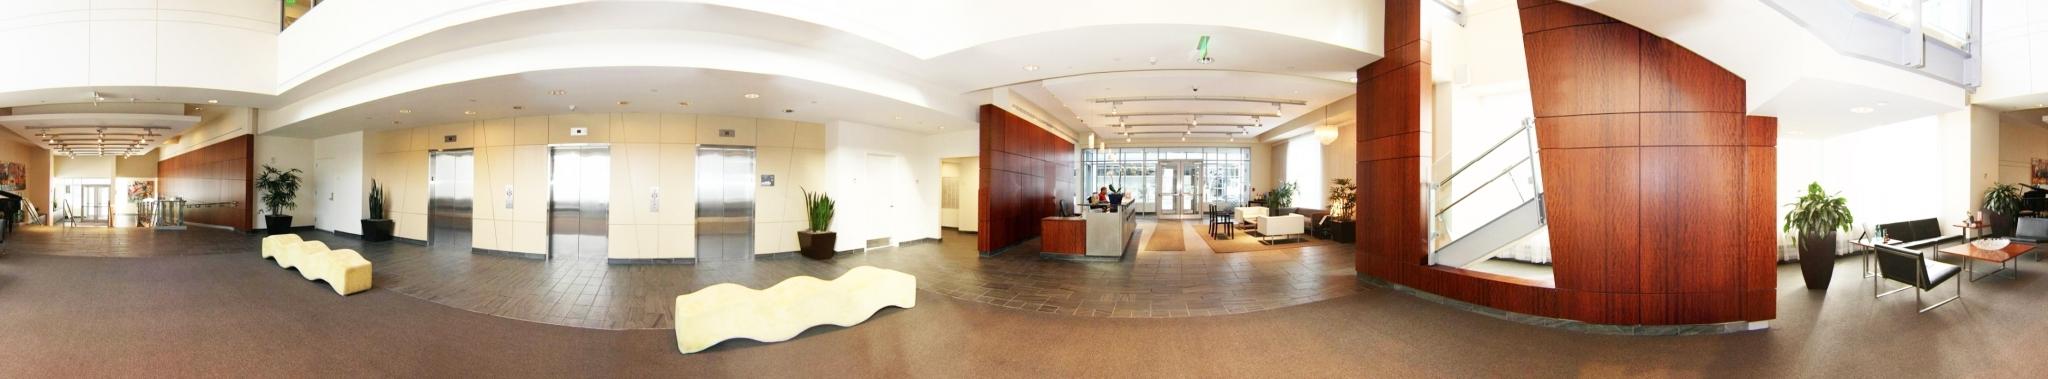 Hartford 21 Lobby